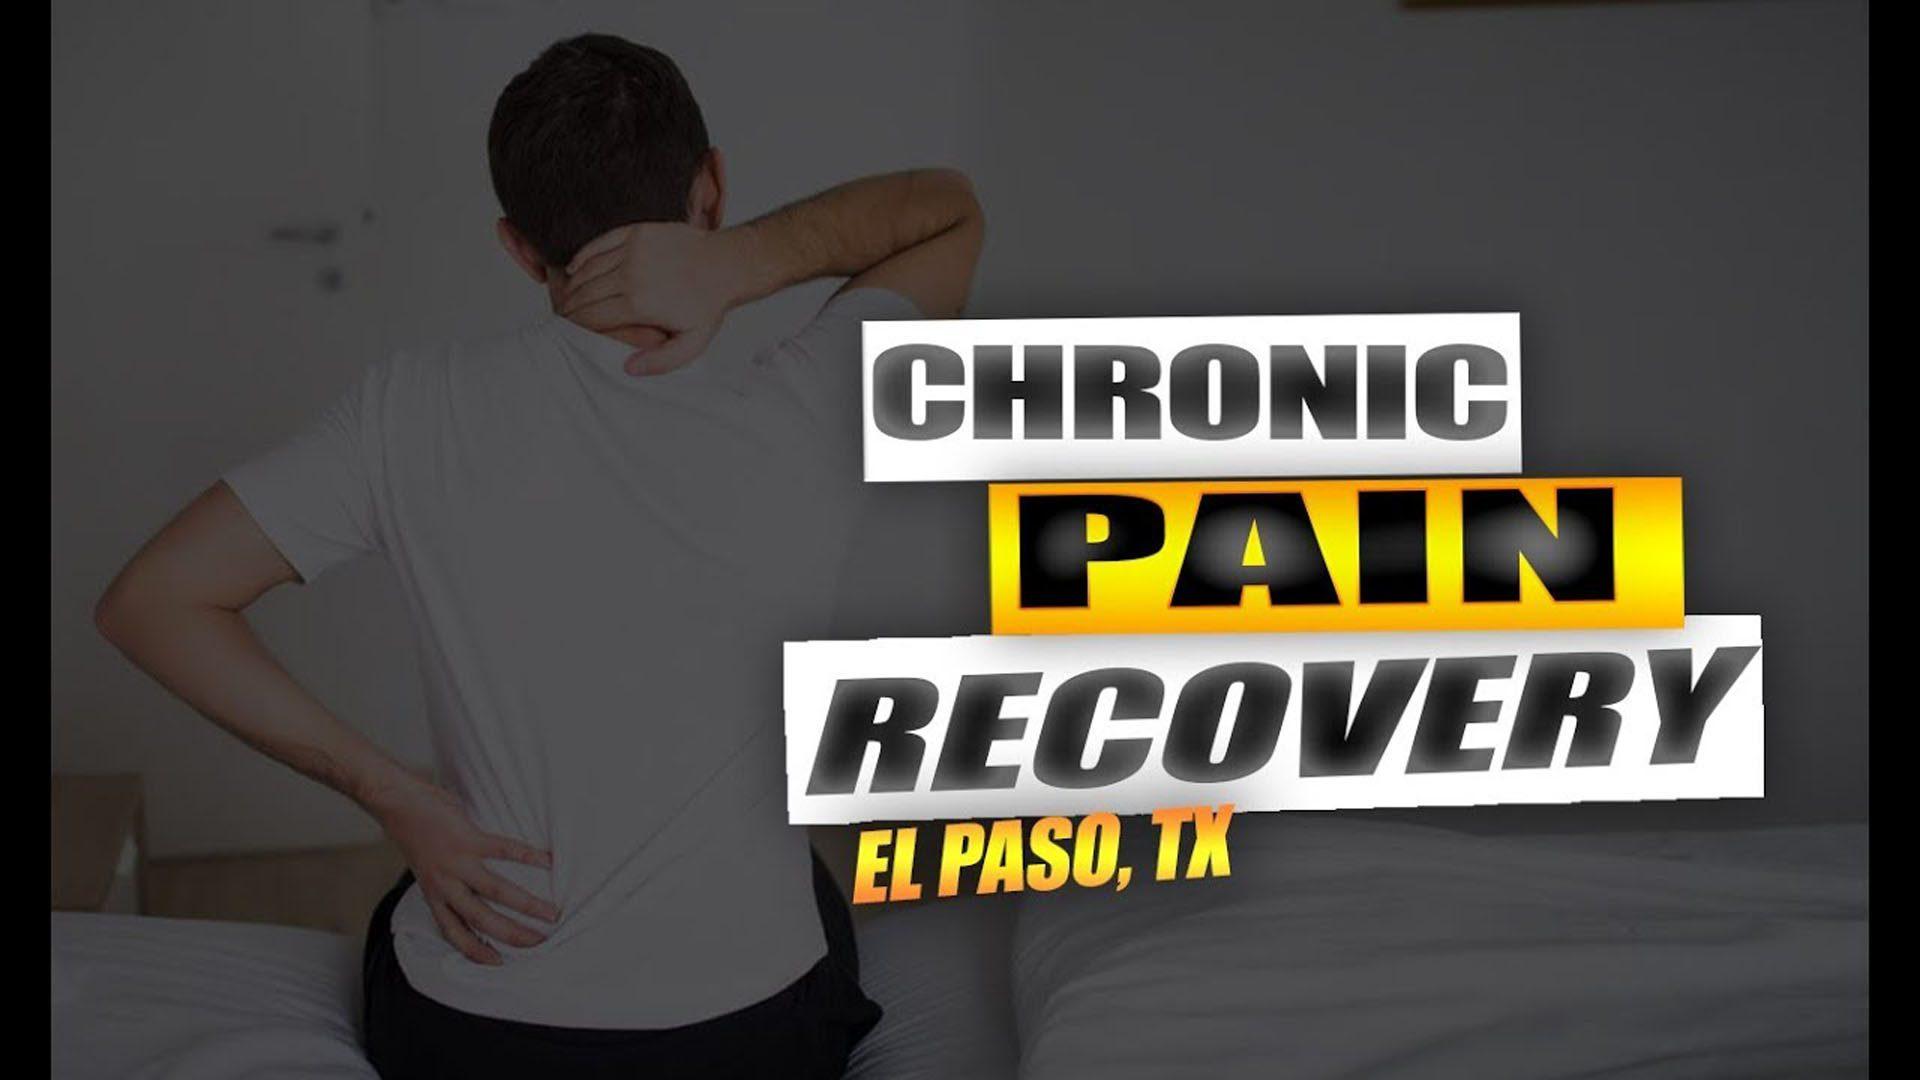 Chronic Pain Recovery | Video | El Paso, TX.